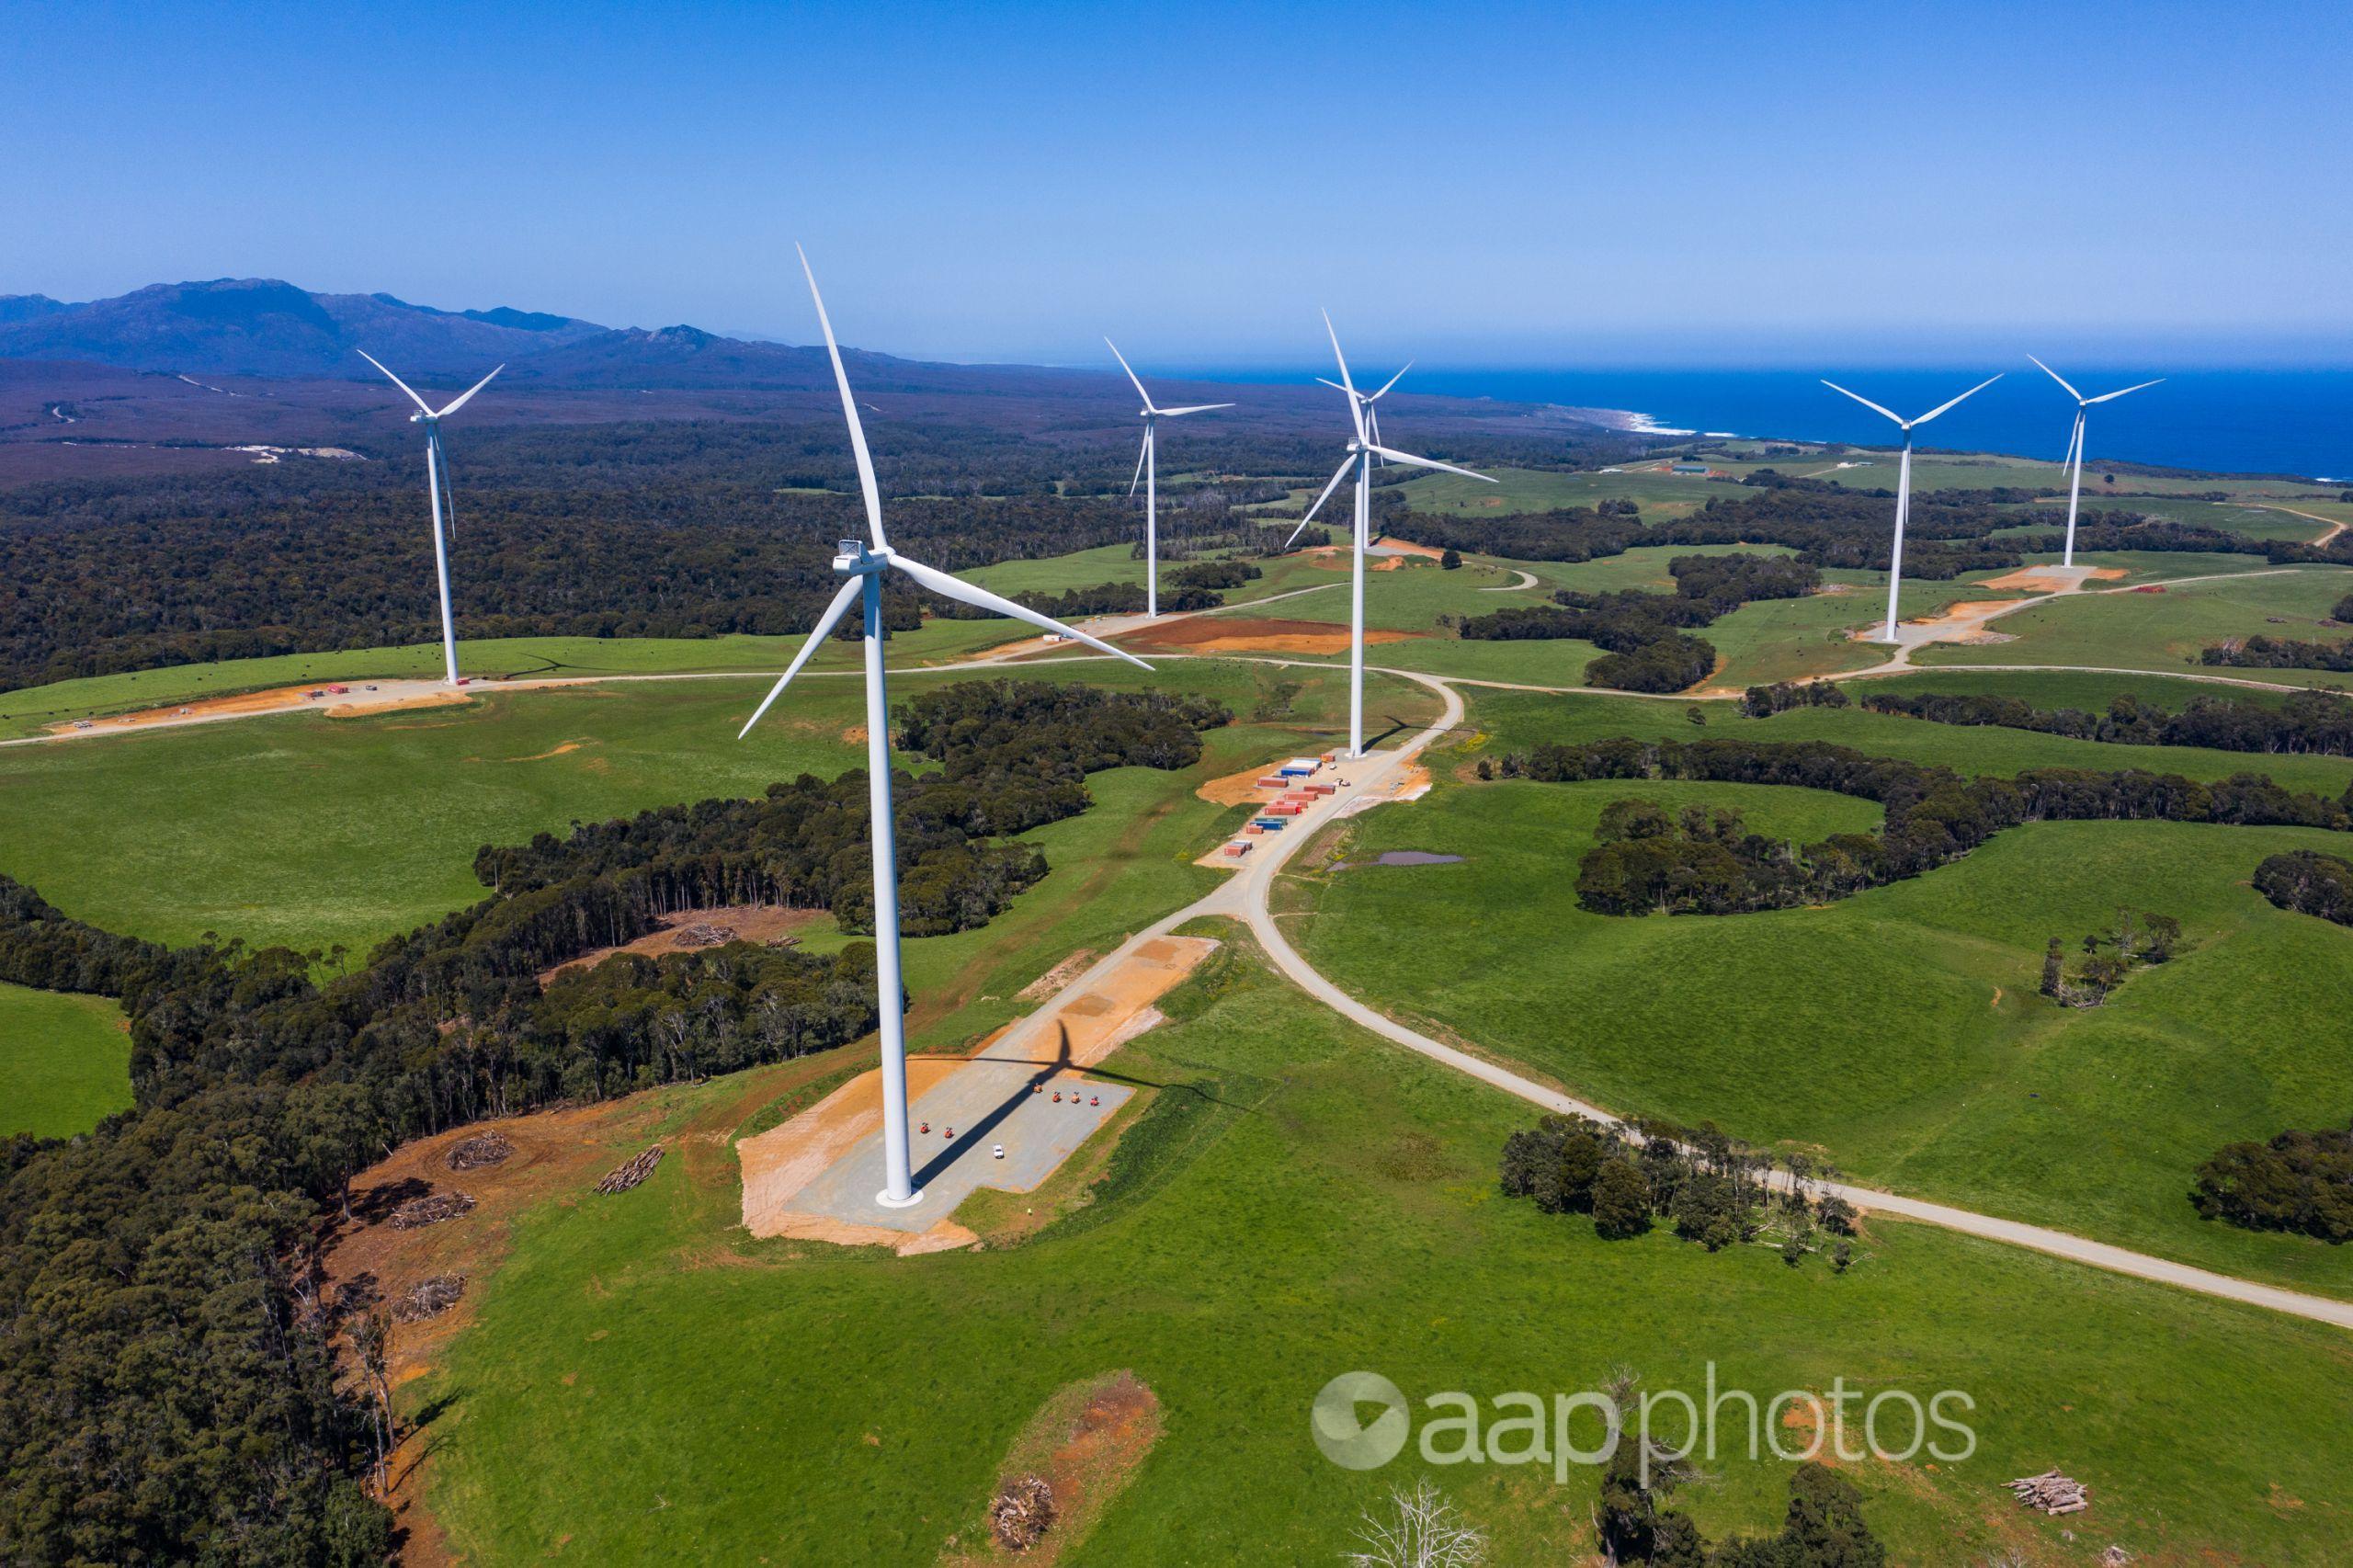 turbines in a green field